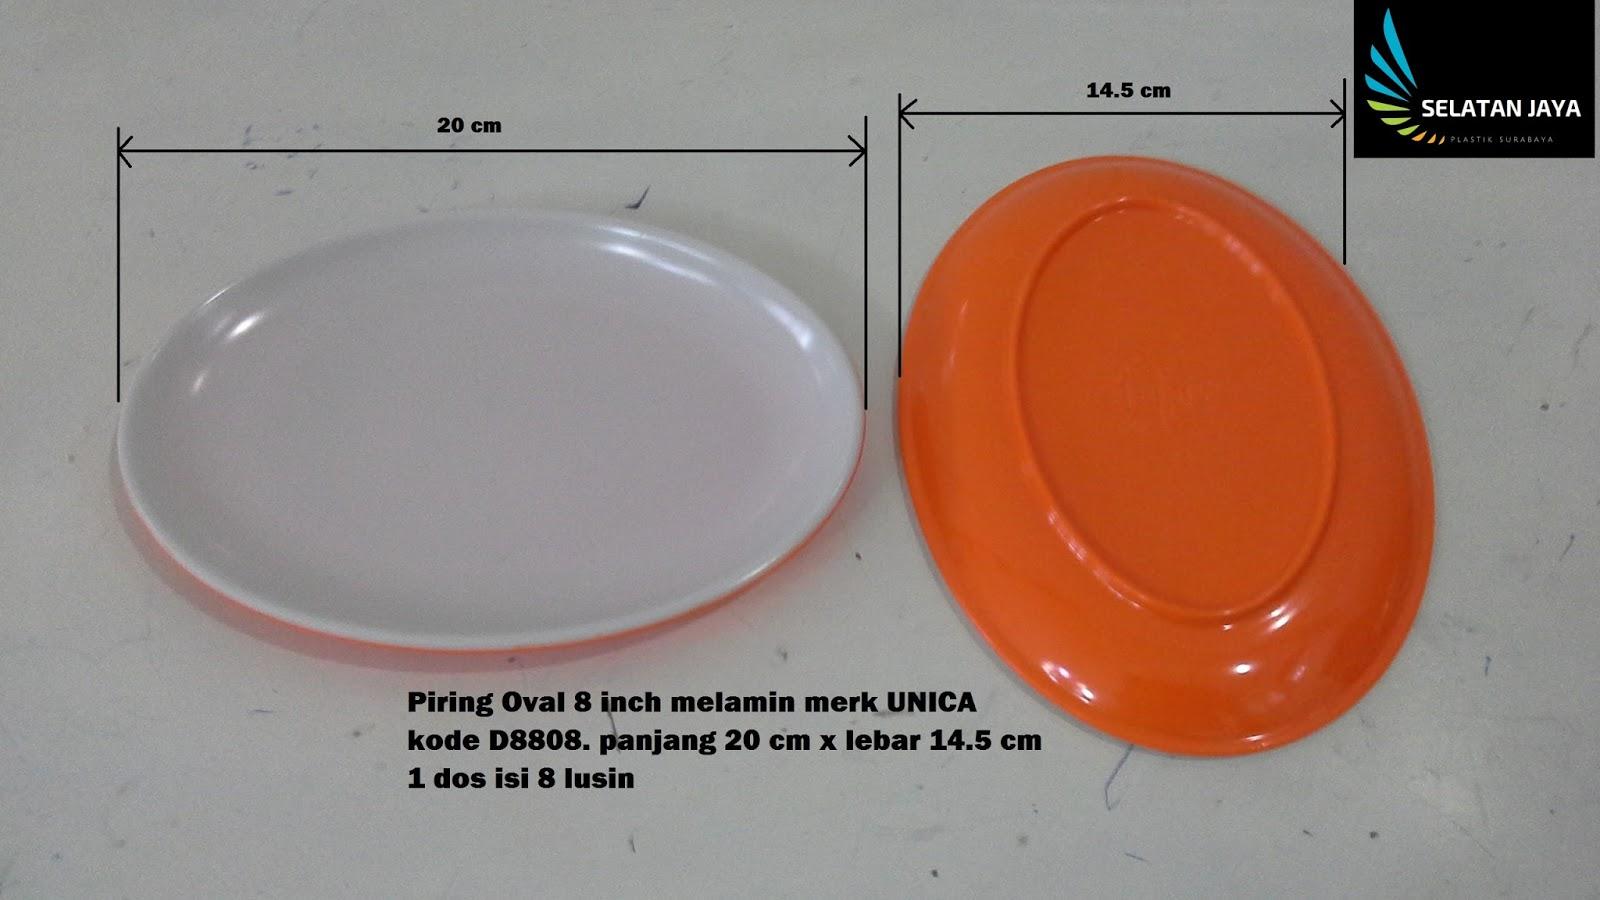 Selatan Jaya distributor barang plastik furnitur Surabaya Indonesia ... fae12d19c5